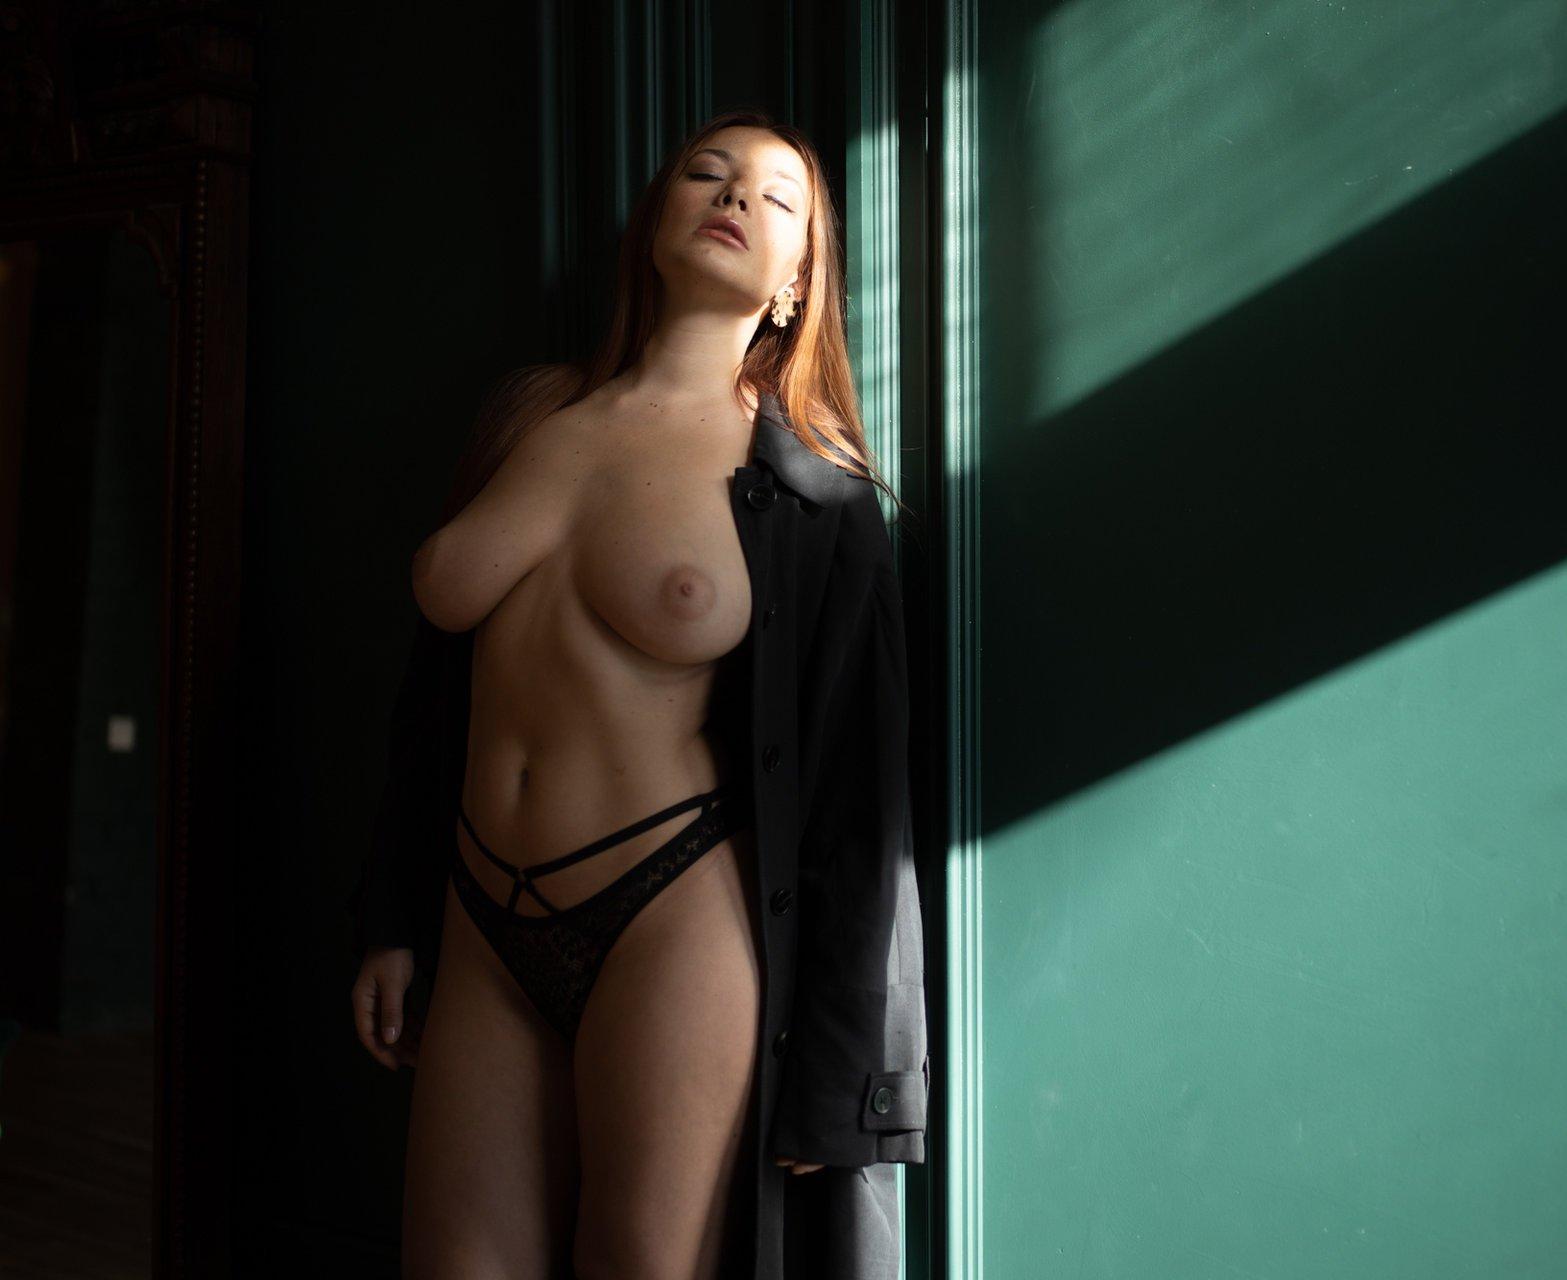 Olga Kobzar Bugs Bunny Gf Nudes Leaks 0001